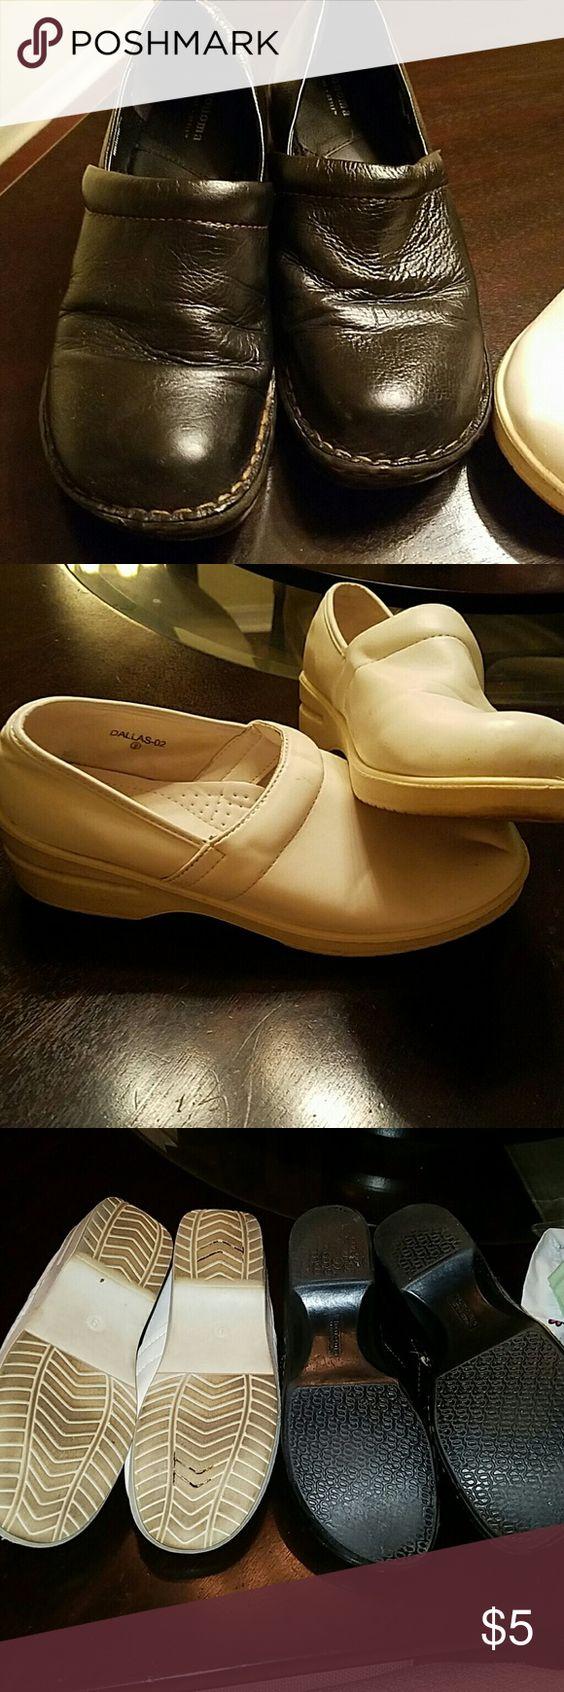 Bundle nurse shoes both used Black pair Sonoma  white pair Refresh both size 9 Shoes Mules & Clogs